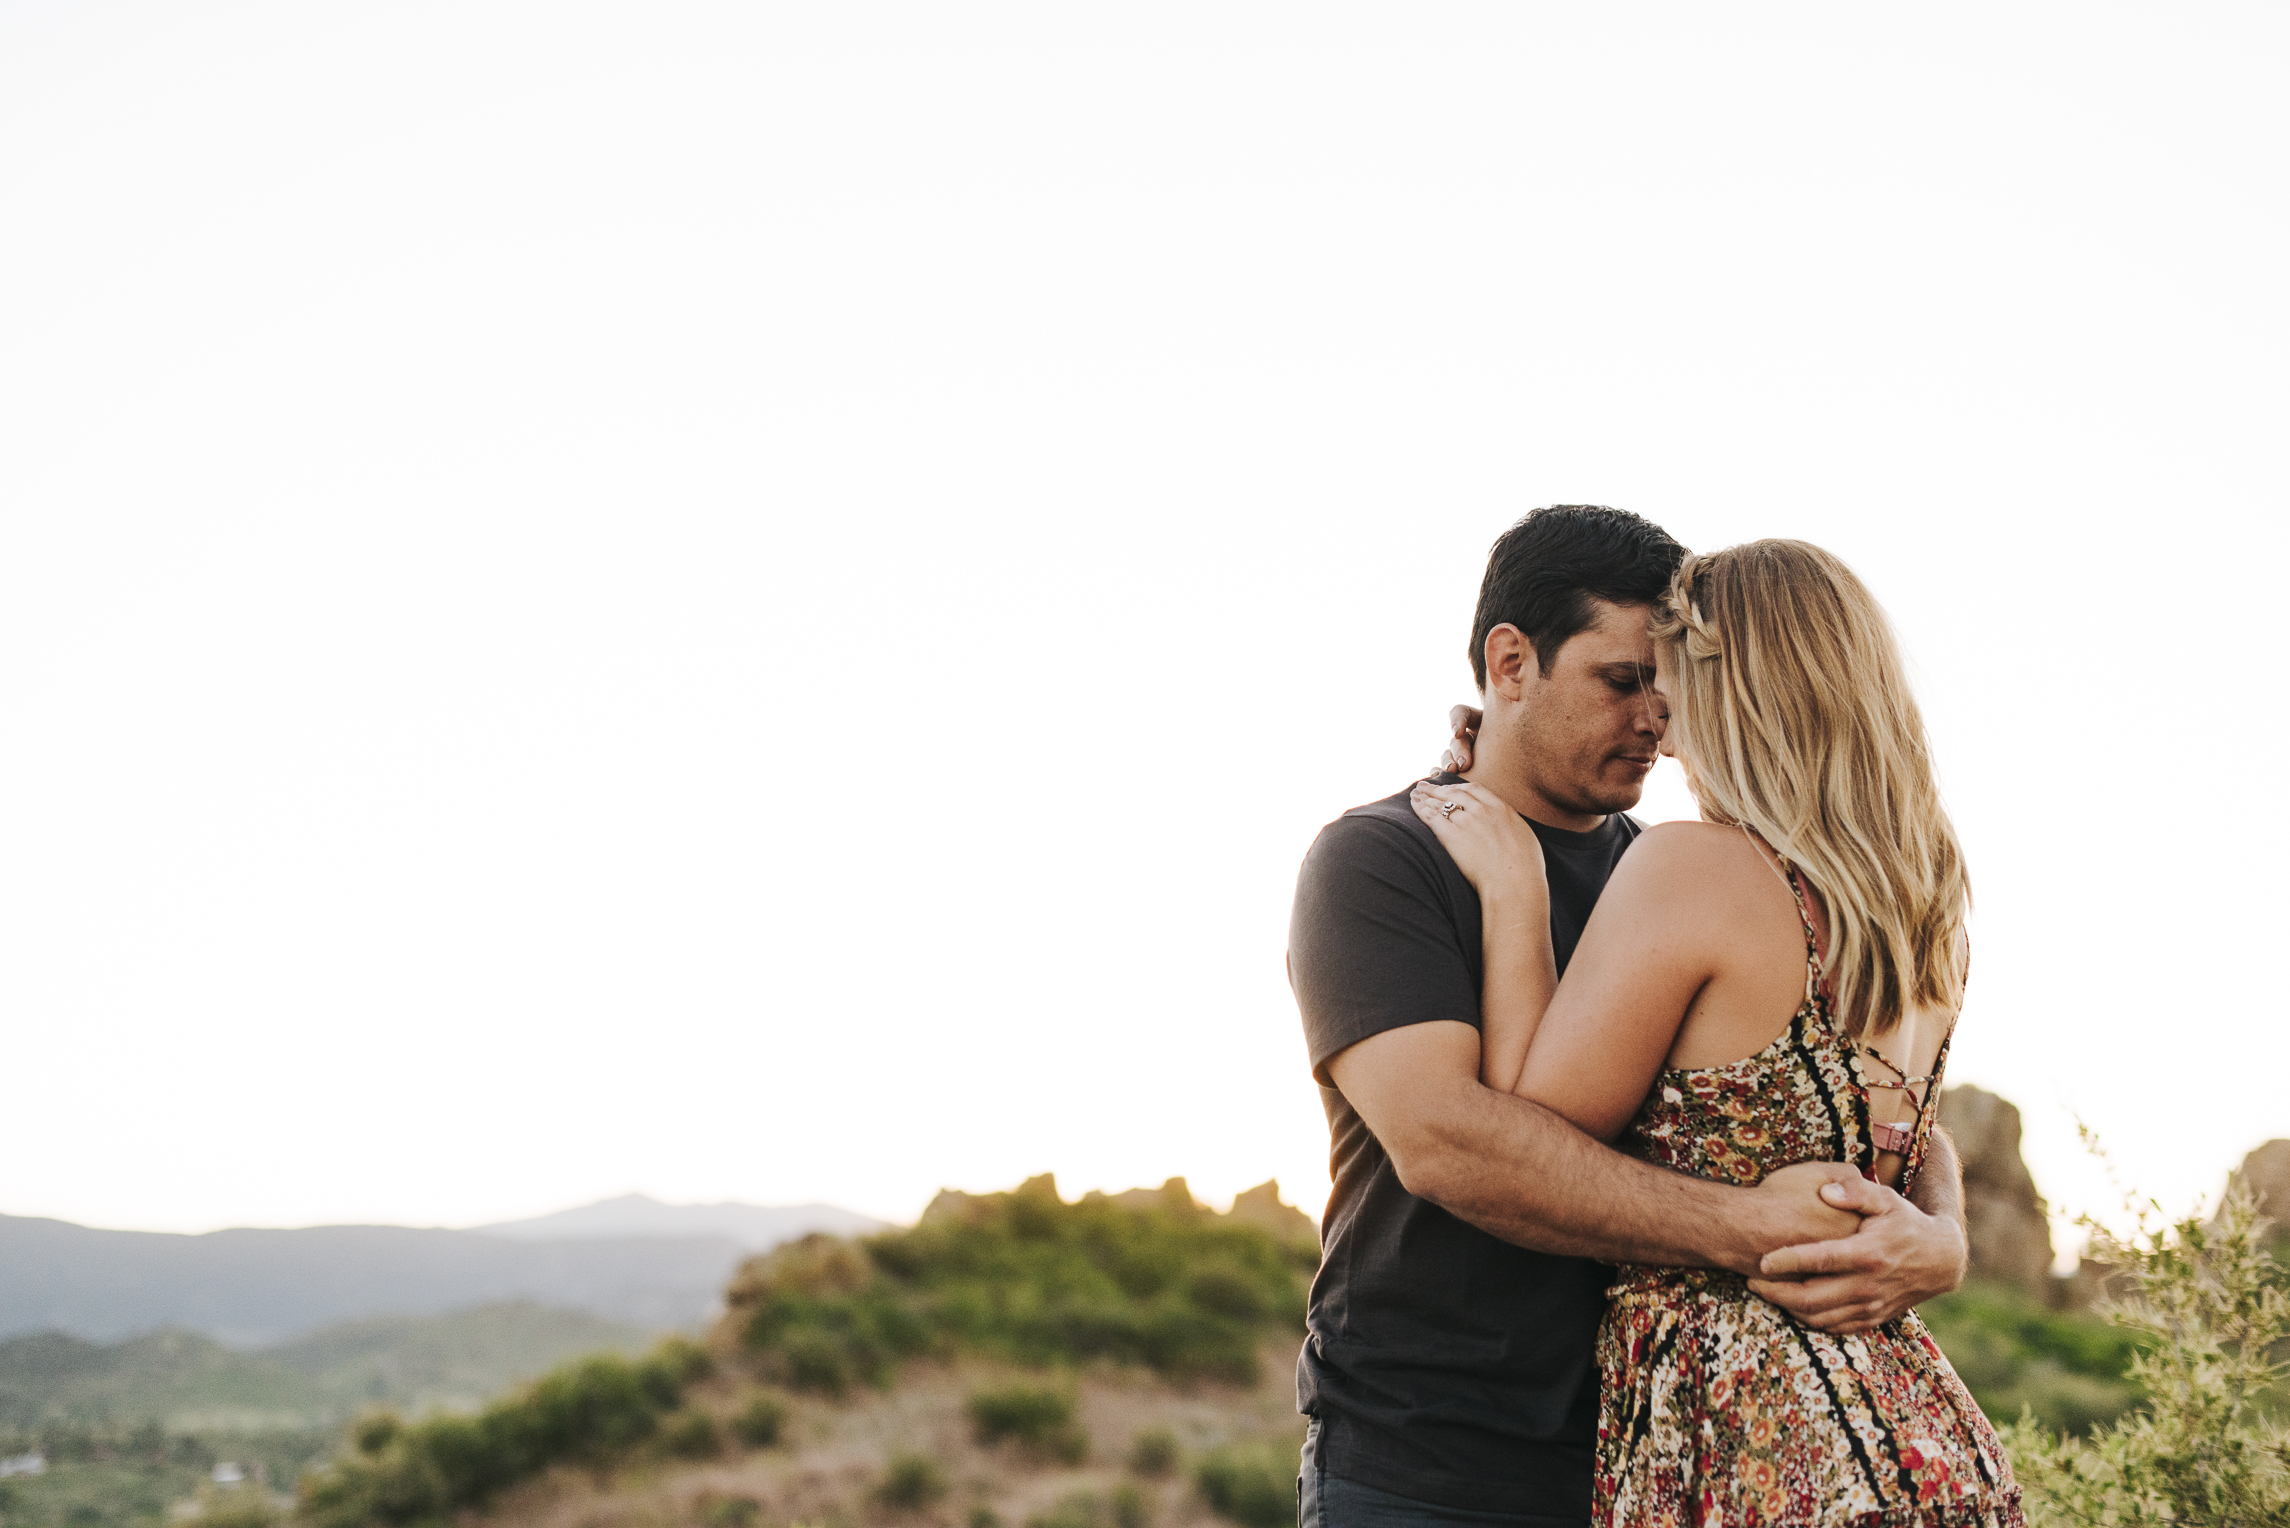 060716 webJAKE & MCKENNA FAMILY PHOTOS - COLORADO PHOTOGRAPHER - DEBI RAE PHOTOGRAPHY-5690.jpg